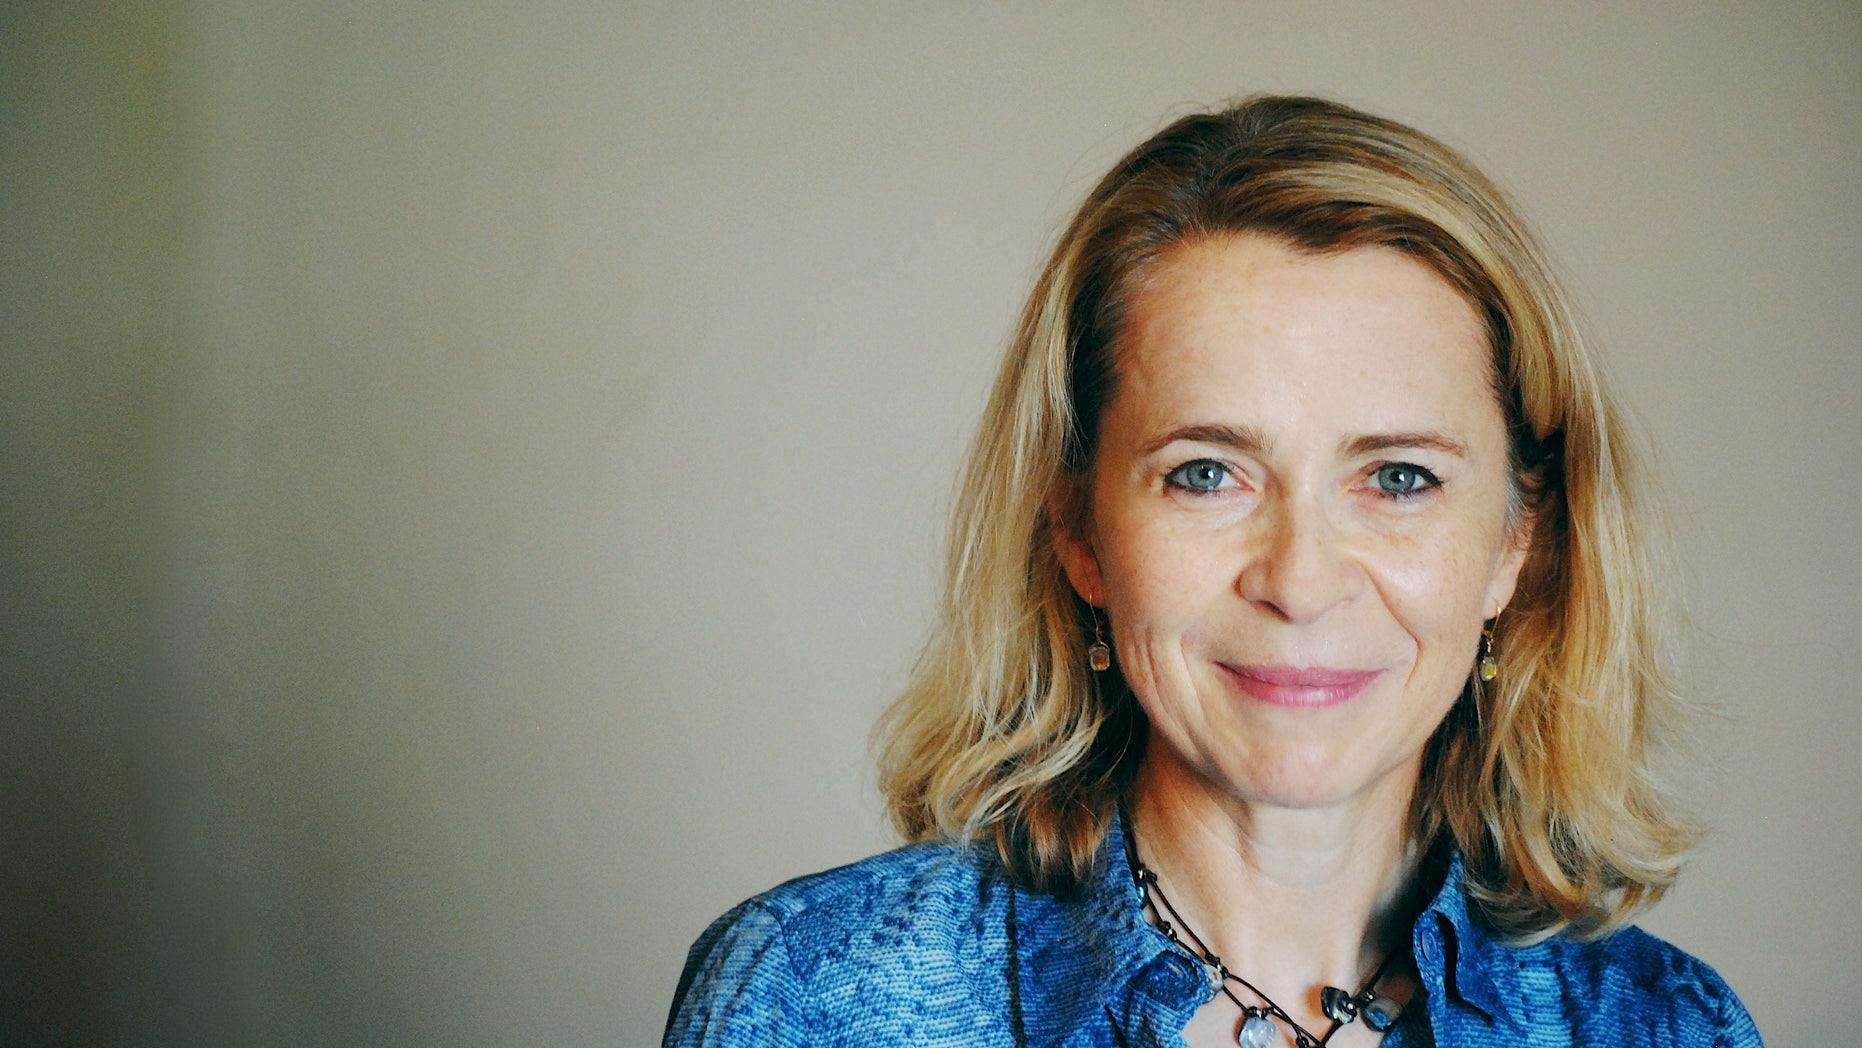 Author Sally Lloyd-Jones (Zondervan)